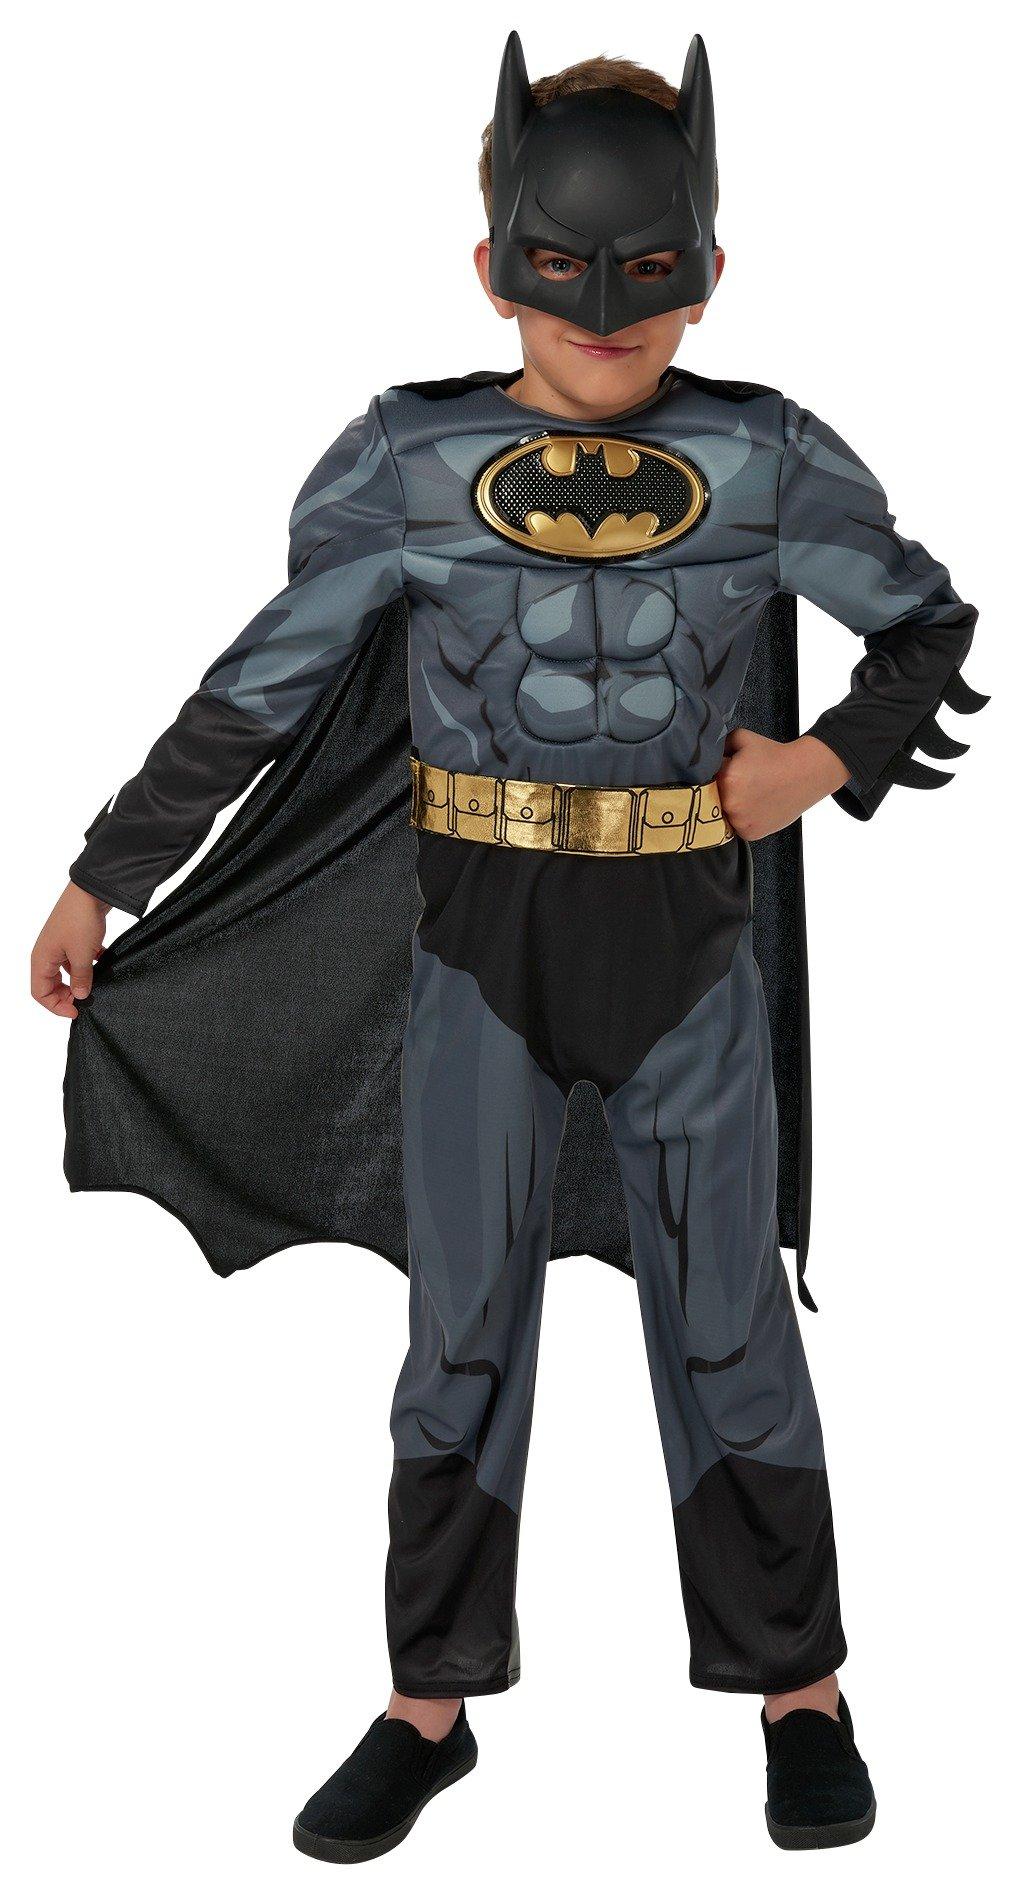 Image of DC Batman Fancy Dress Costume - 7-8 Years